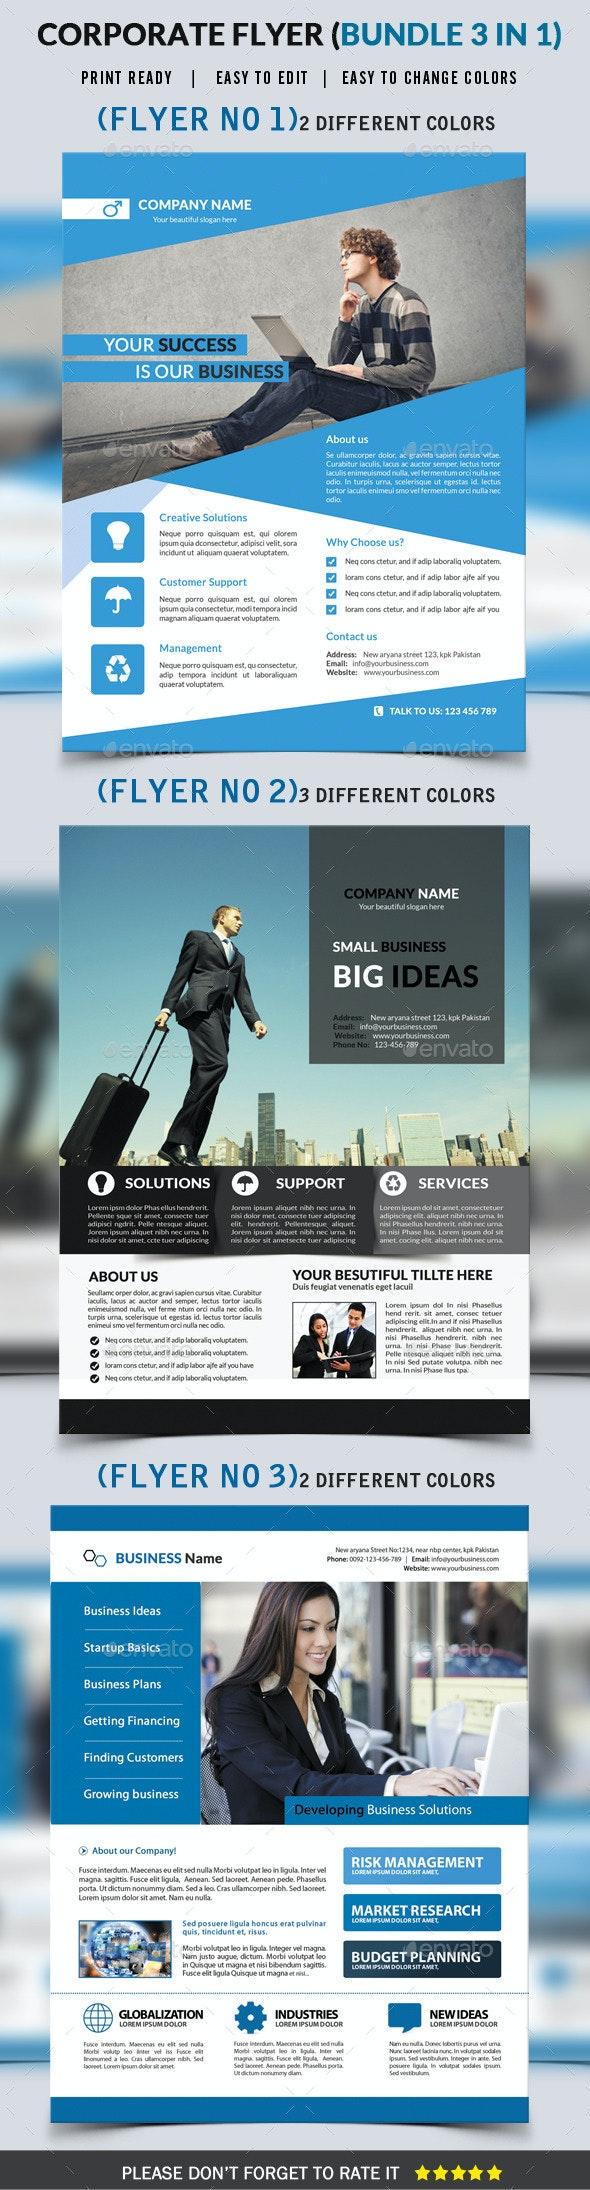 Corporate Flyer Bundle 3 in 1 - Corporate Flyers